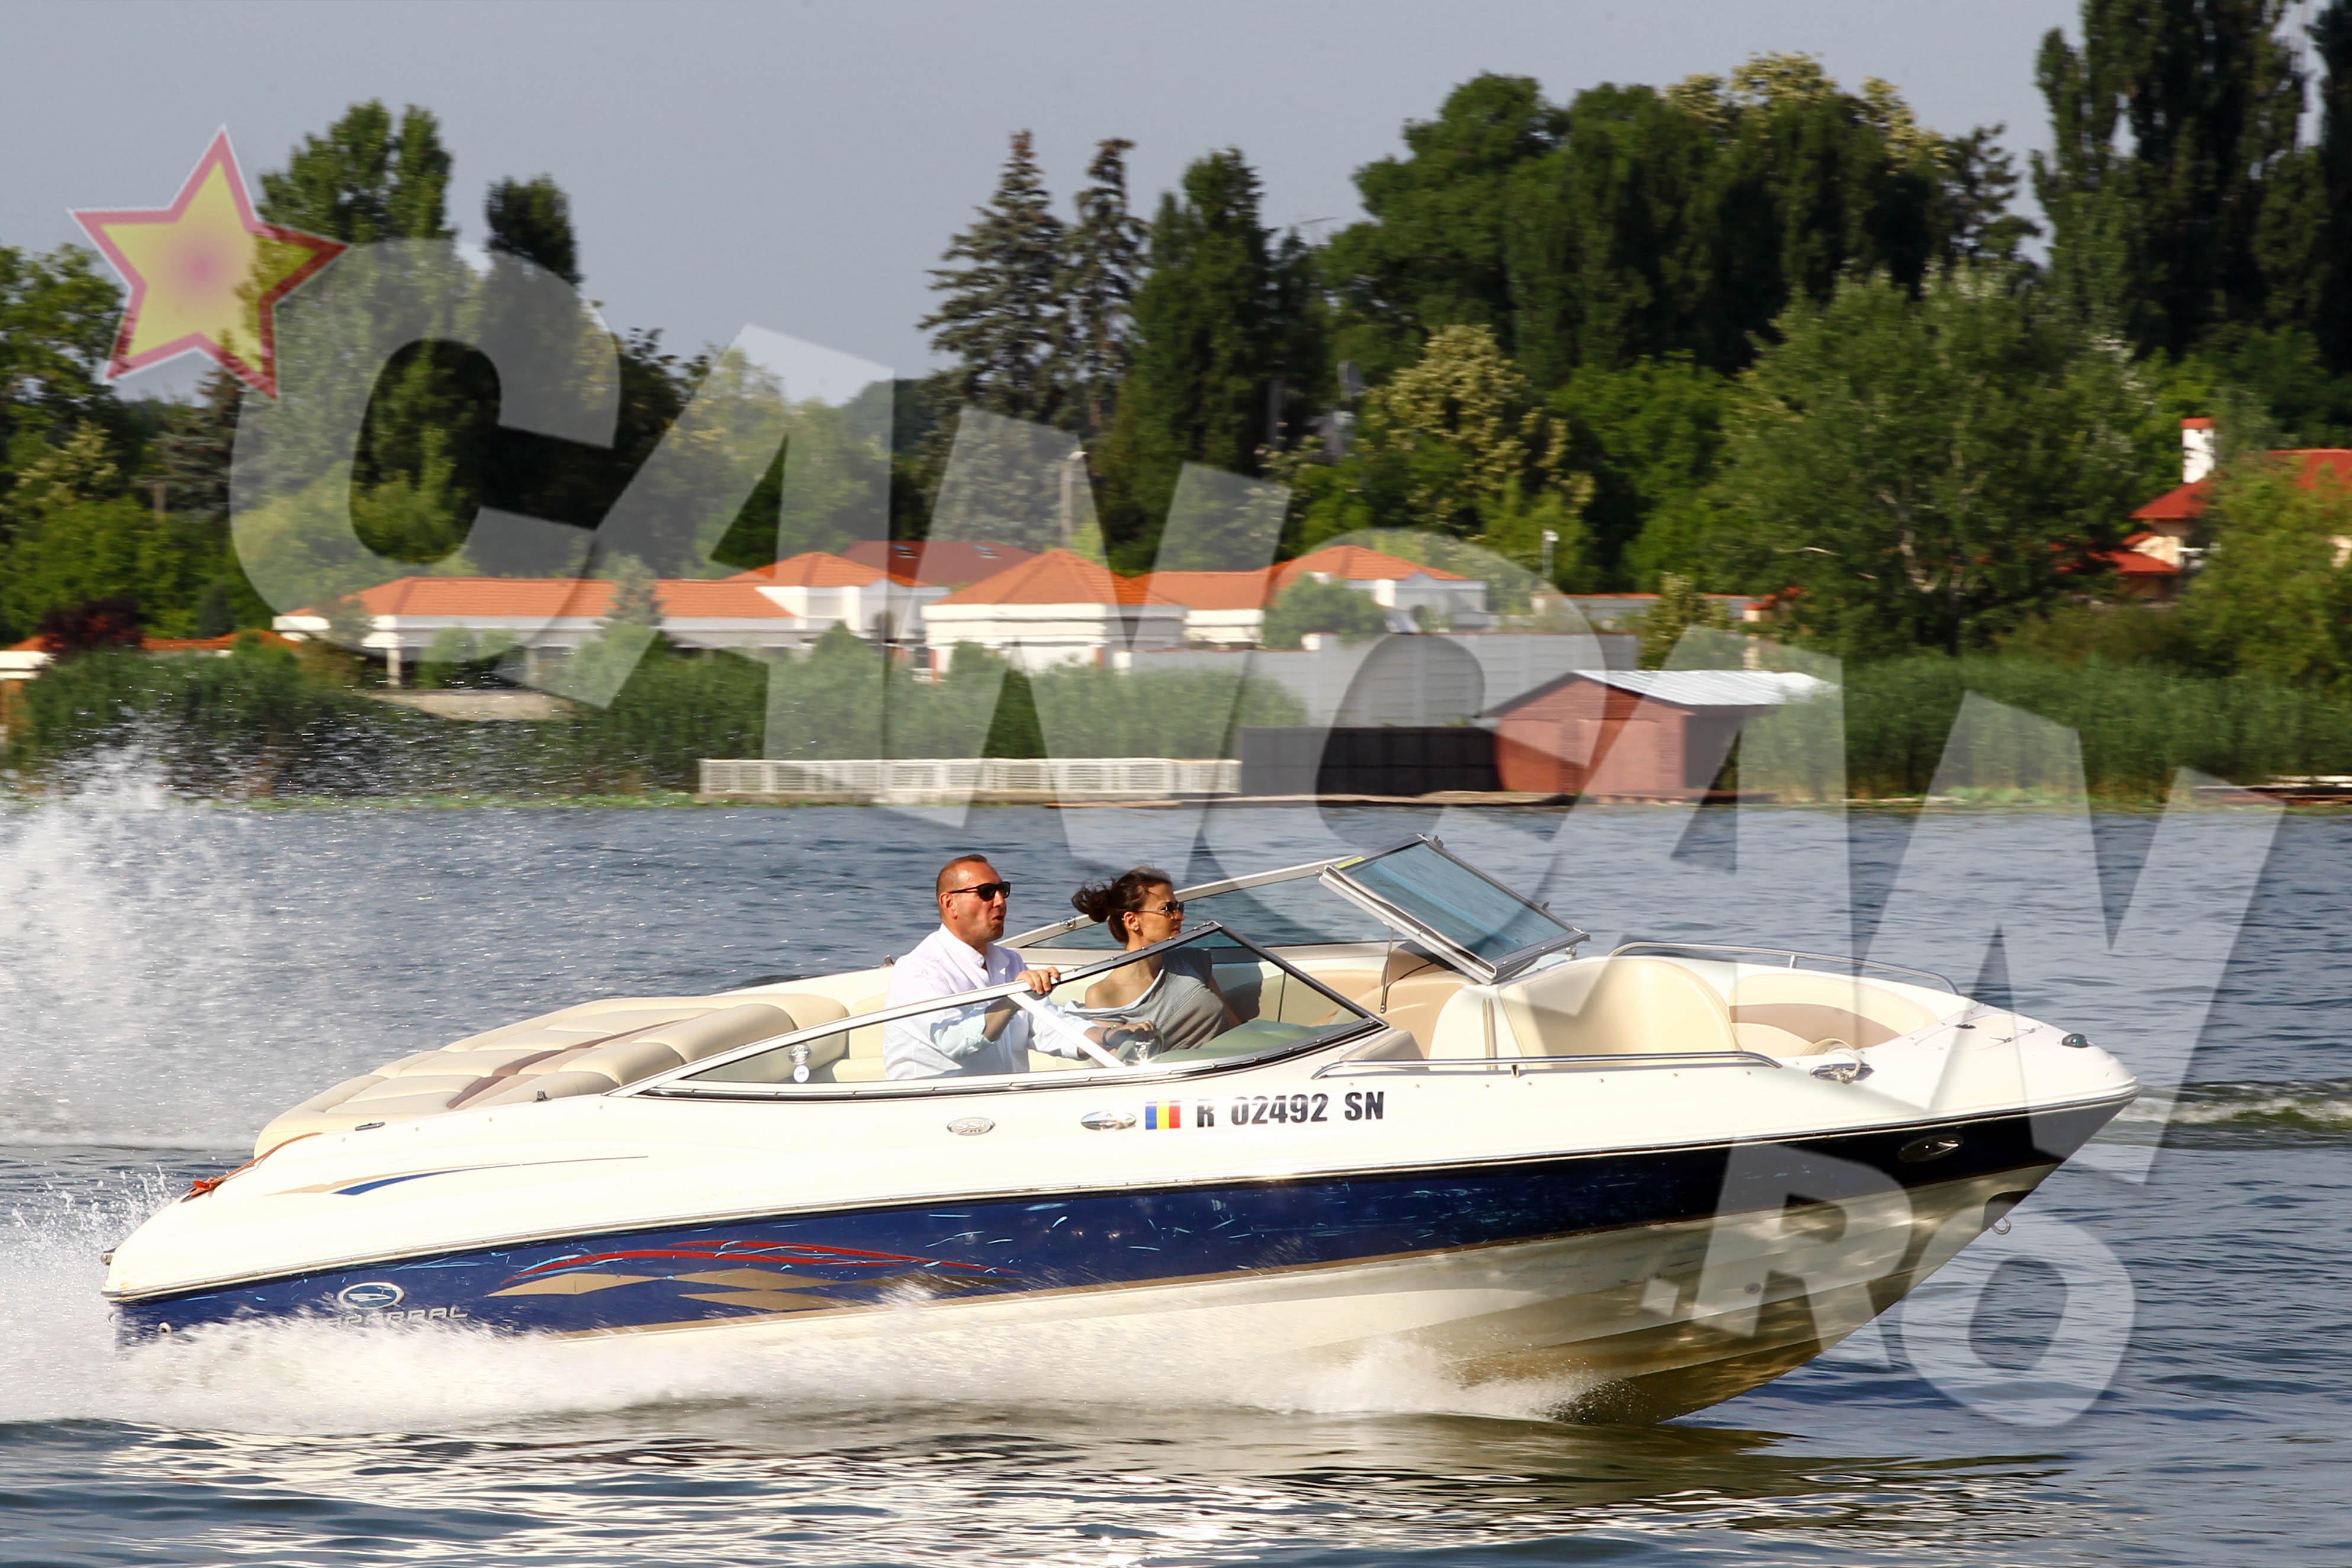 Cu doar un weekend inainte de nunta, Viorel Catarama si Adina Alberts au iesit la o plimbare romantica pe Snagov, intr-o ambarcatiune